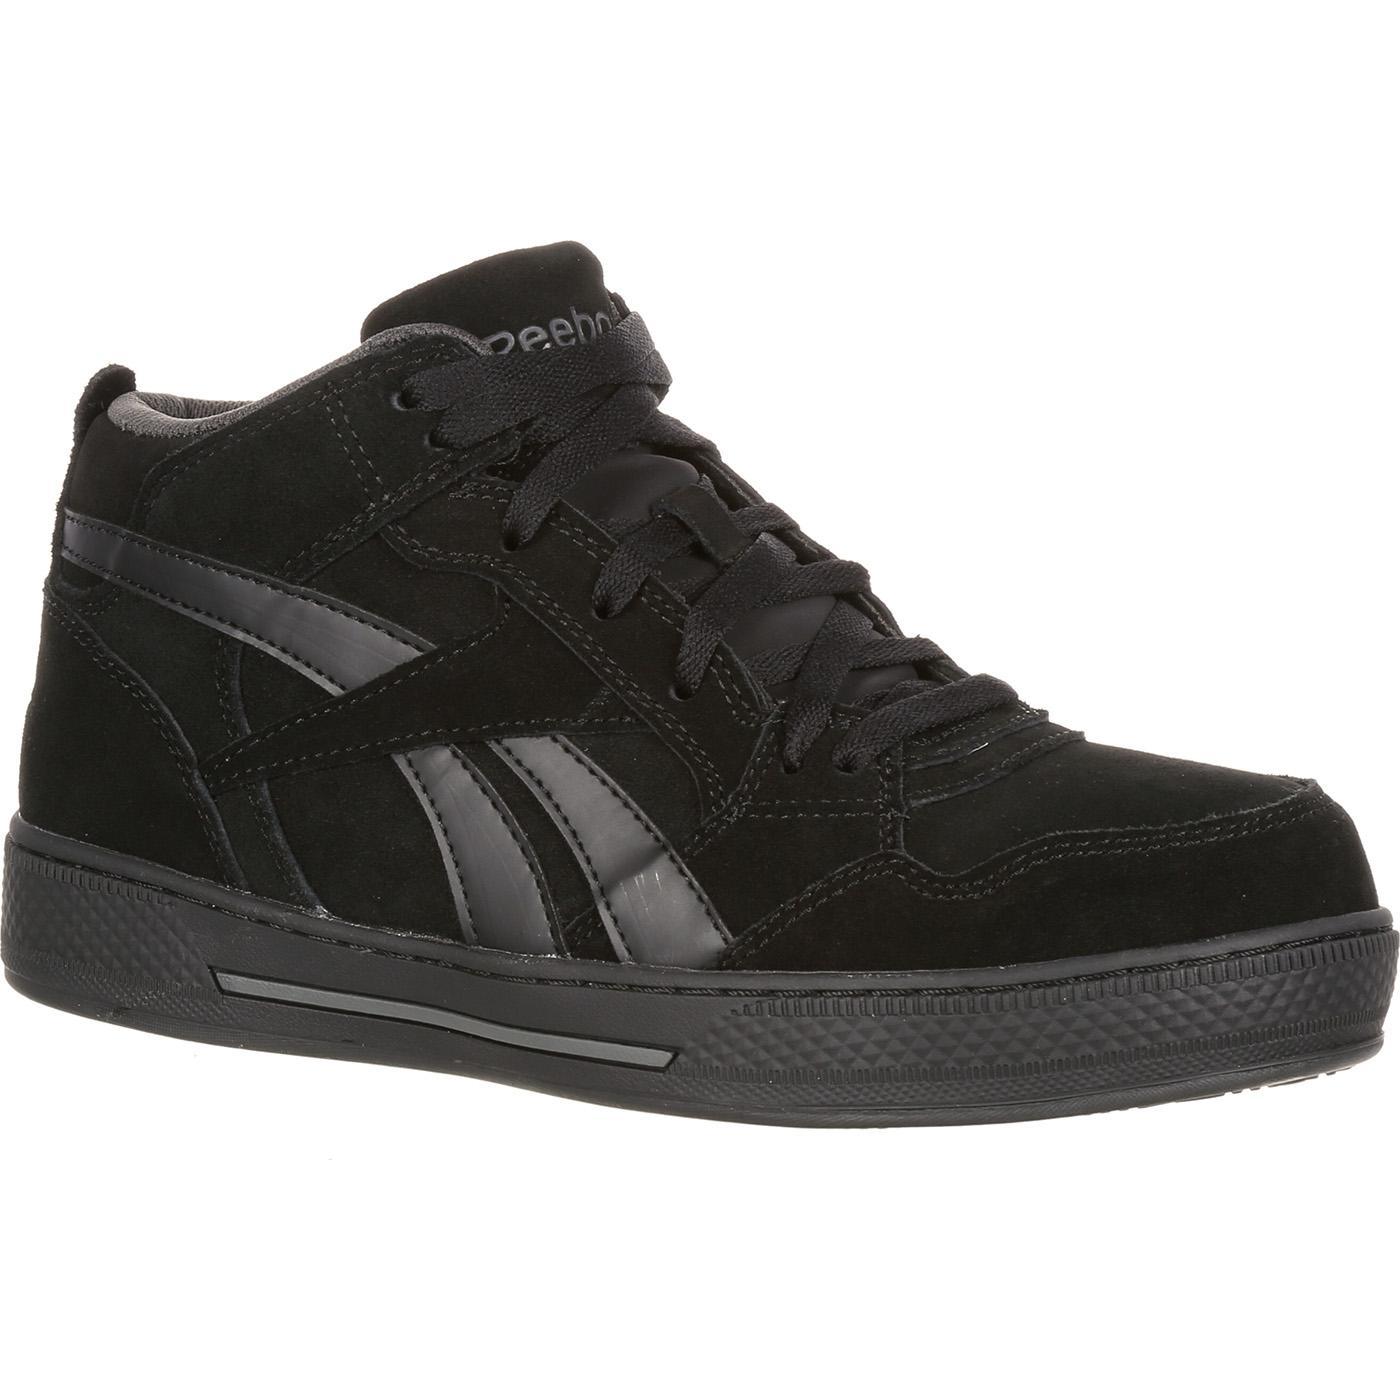 49b0fc2aaefa Reebok Dayod Composite Toe Work Skate ShoeReebok Dayod Composite Toe Work  Skate Shoe